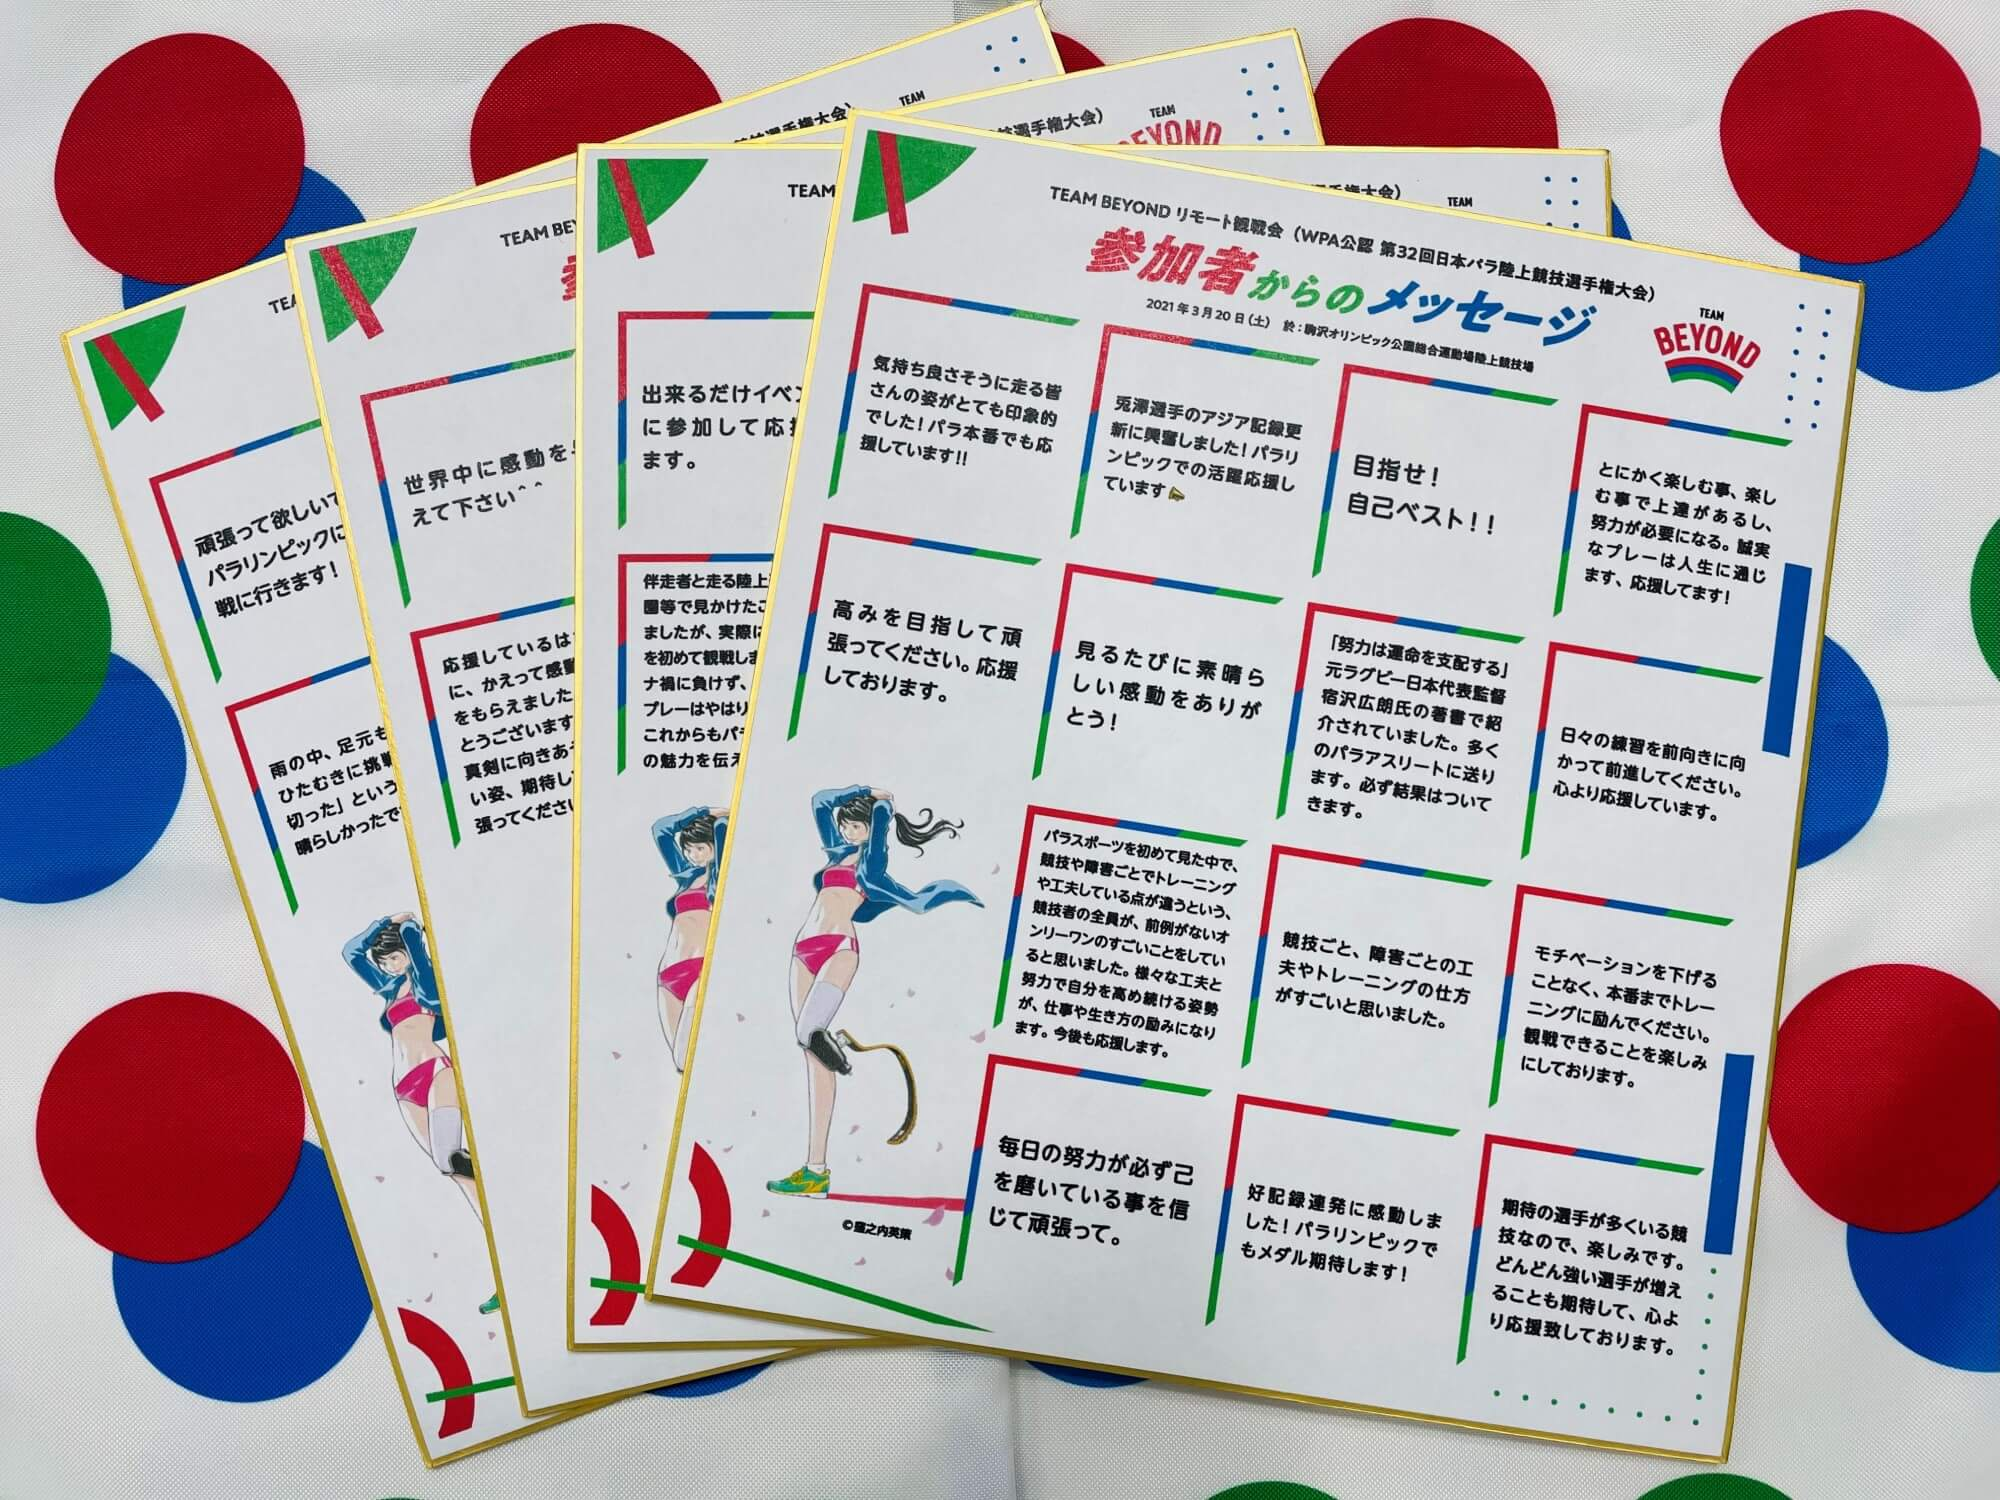 「WPA公認 第32回日本パラ陸上競技選手権大会」リモート観戦会、オンライン交流会を開催!